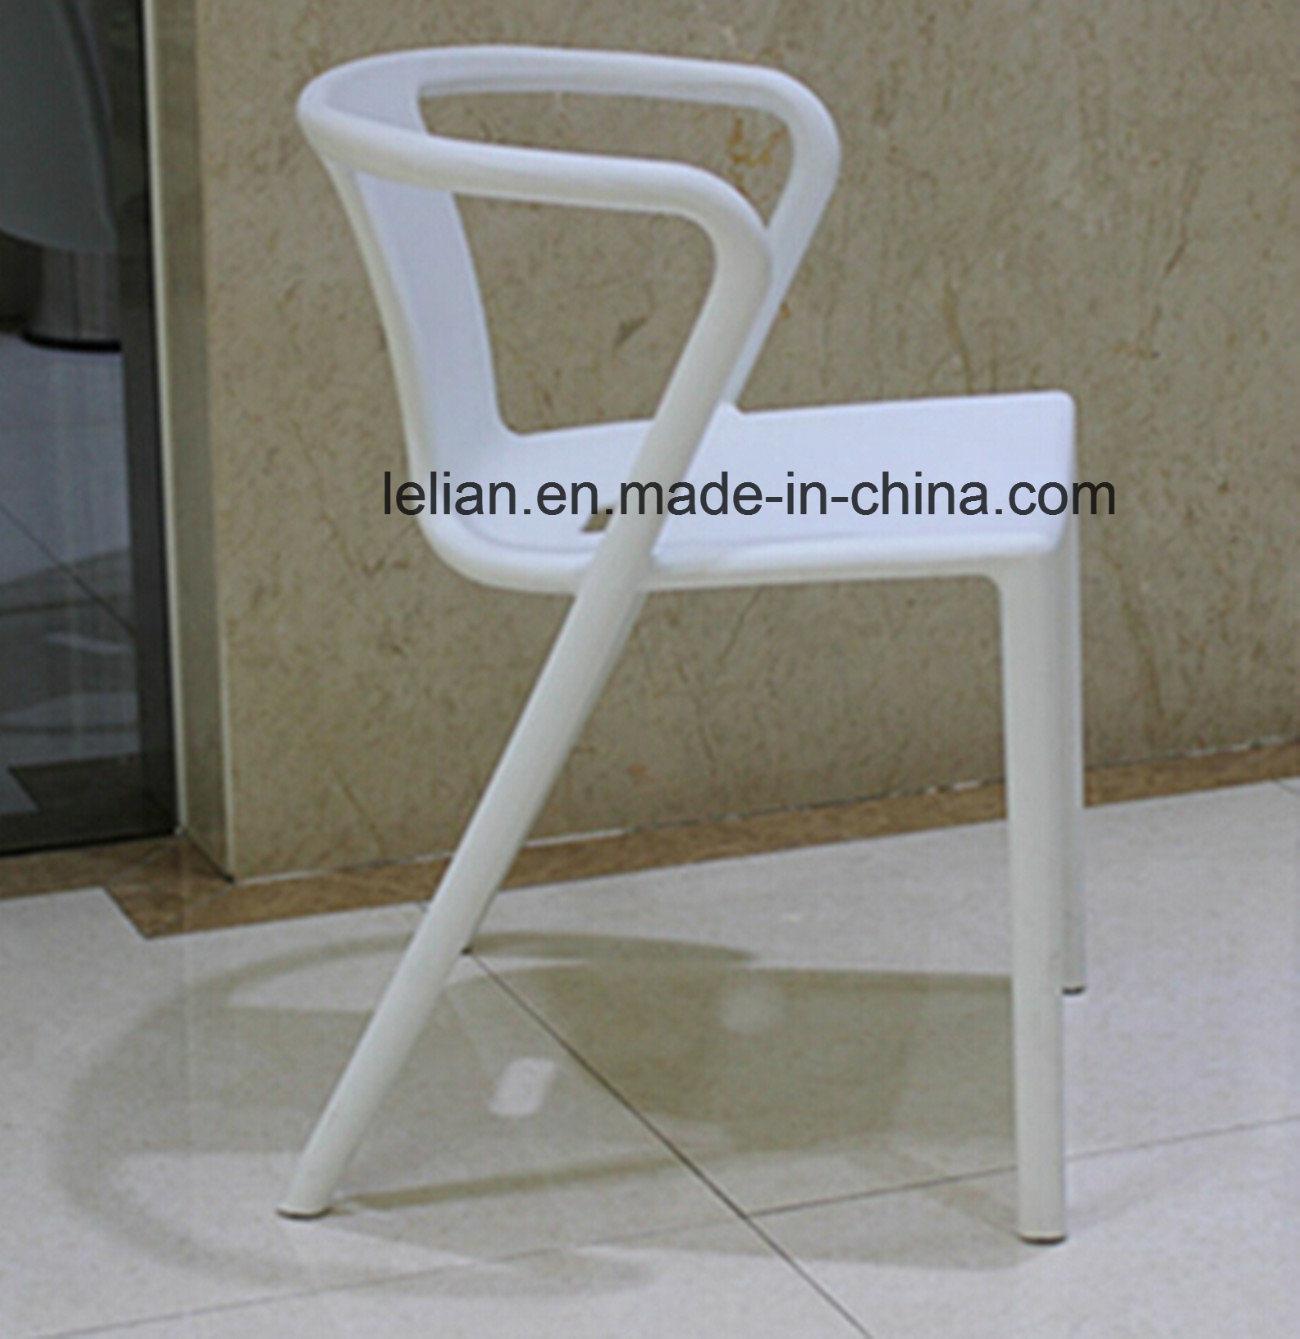 Modern Design High Quatlity Plastic PP Eames Chair for Sale (LL-0069)